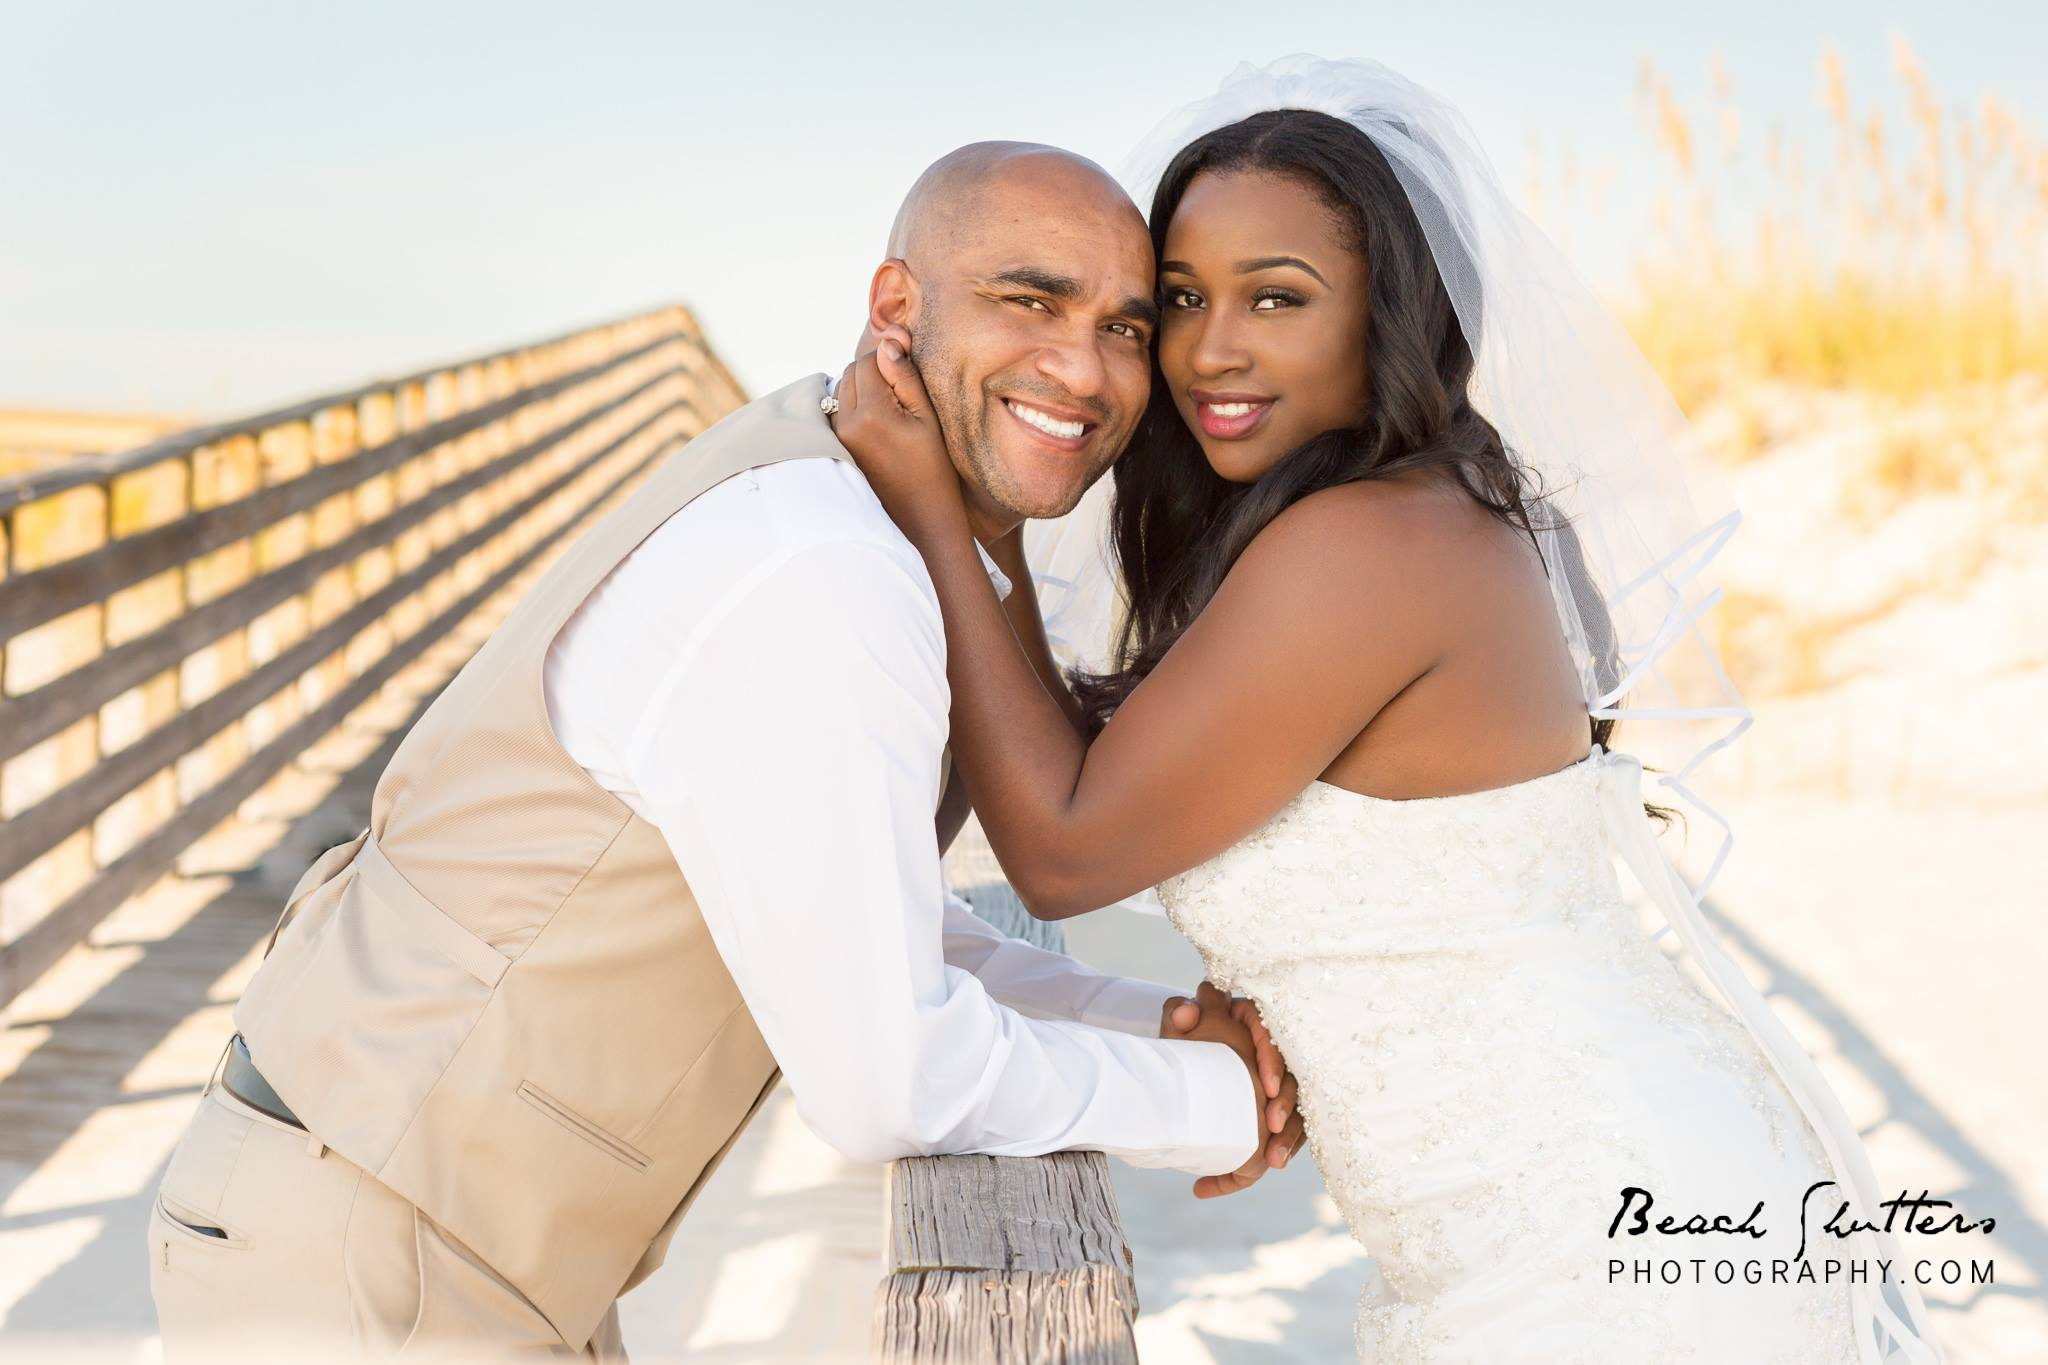 Wedding on the boardwalk in Orange Beach Al